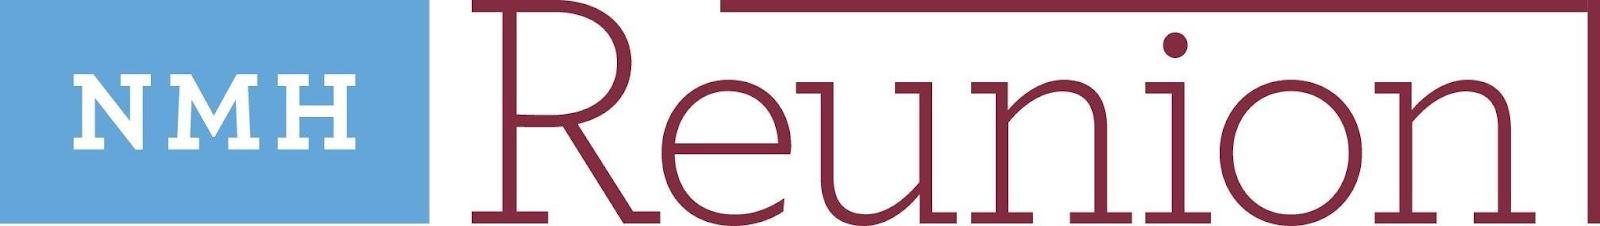 \\DATASHARE\AdminShare\ADV\Alumni and Parent Programs\Seals and Logos\Reunion\NMH Reunion - NEW.jpg